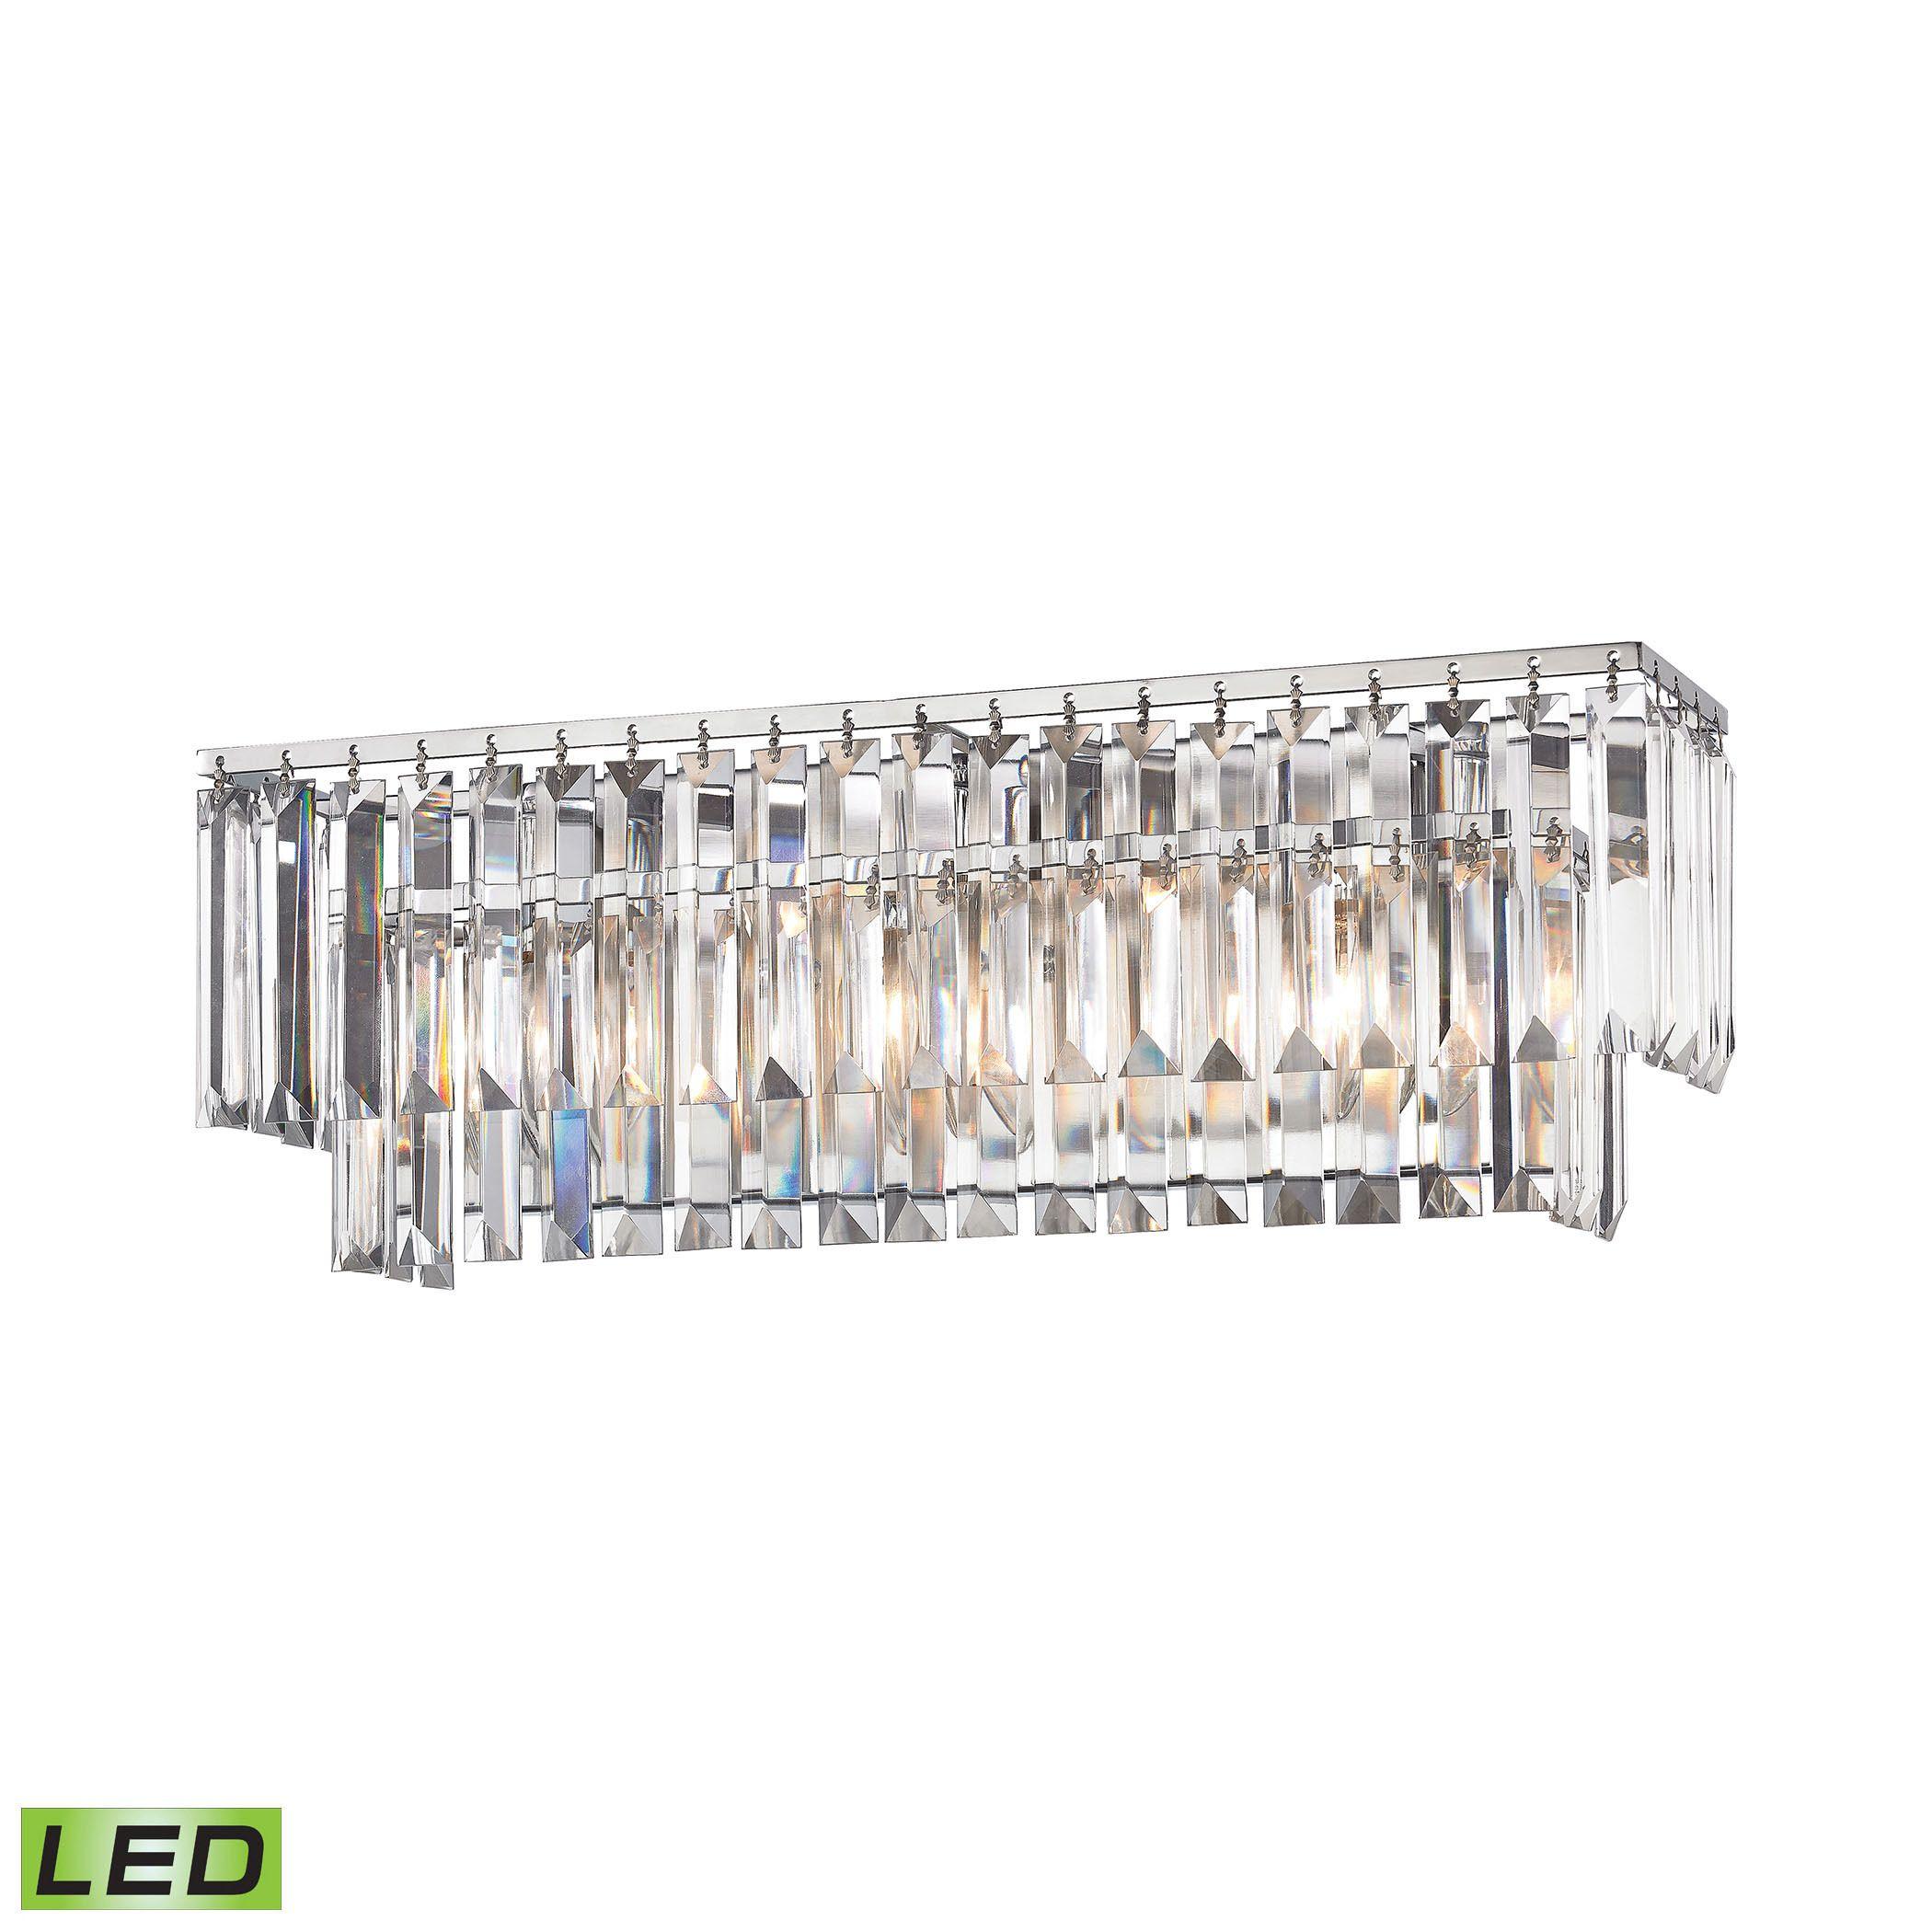 Elk Palacial 3-light LED Vanity in Polished Chrome (Polished Chrome), Silver (Crystal)